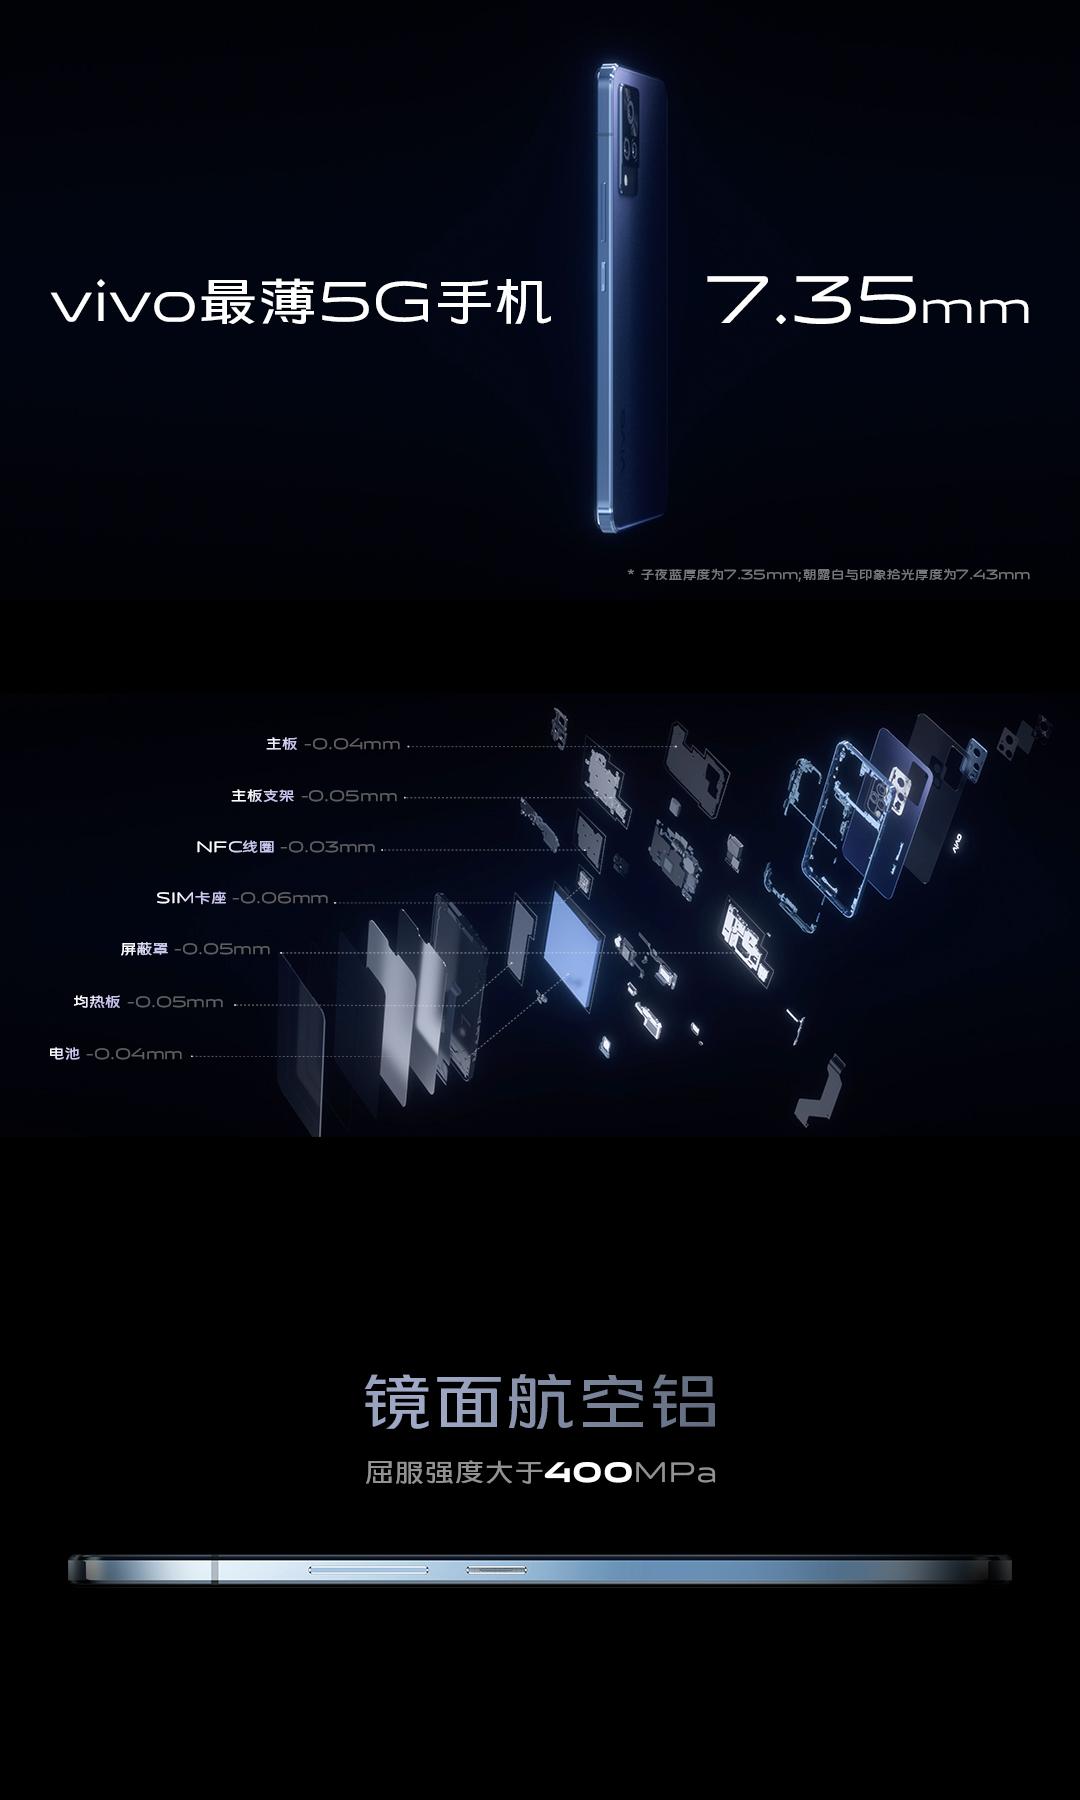 3【vivo最薄5G手机】.jpg